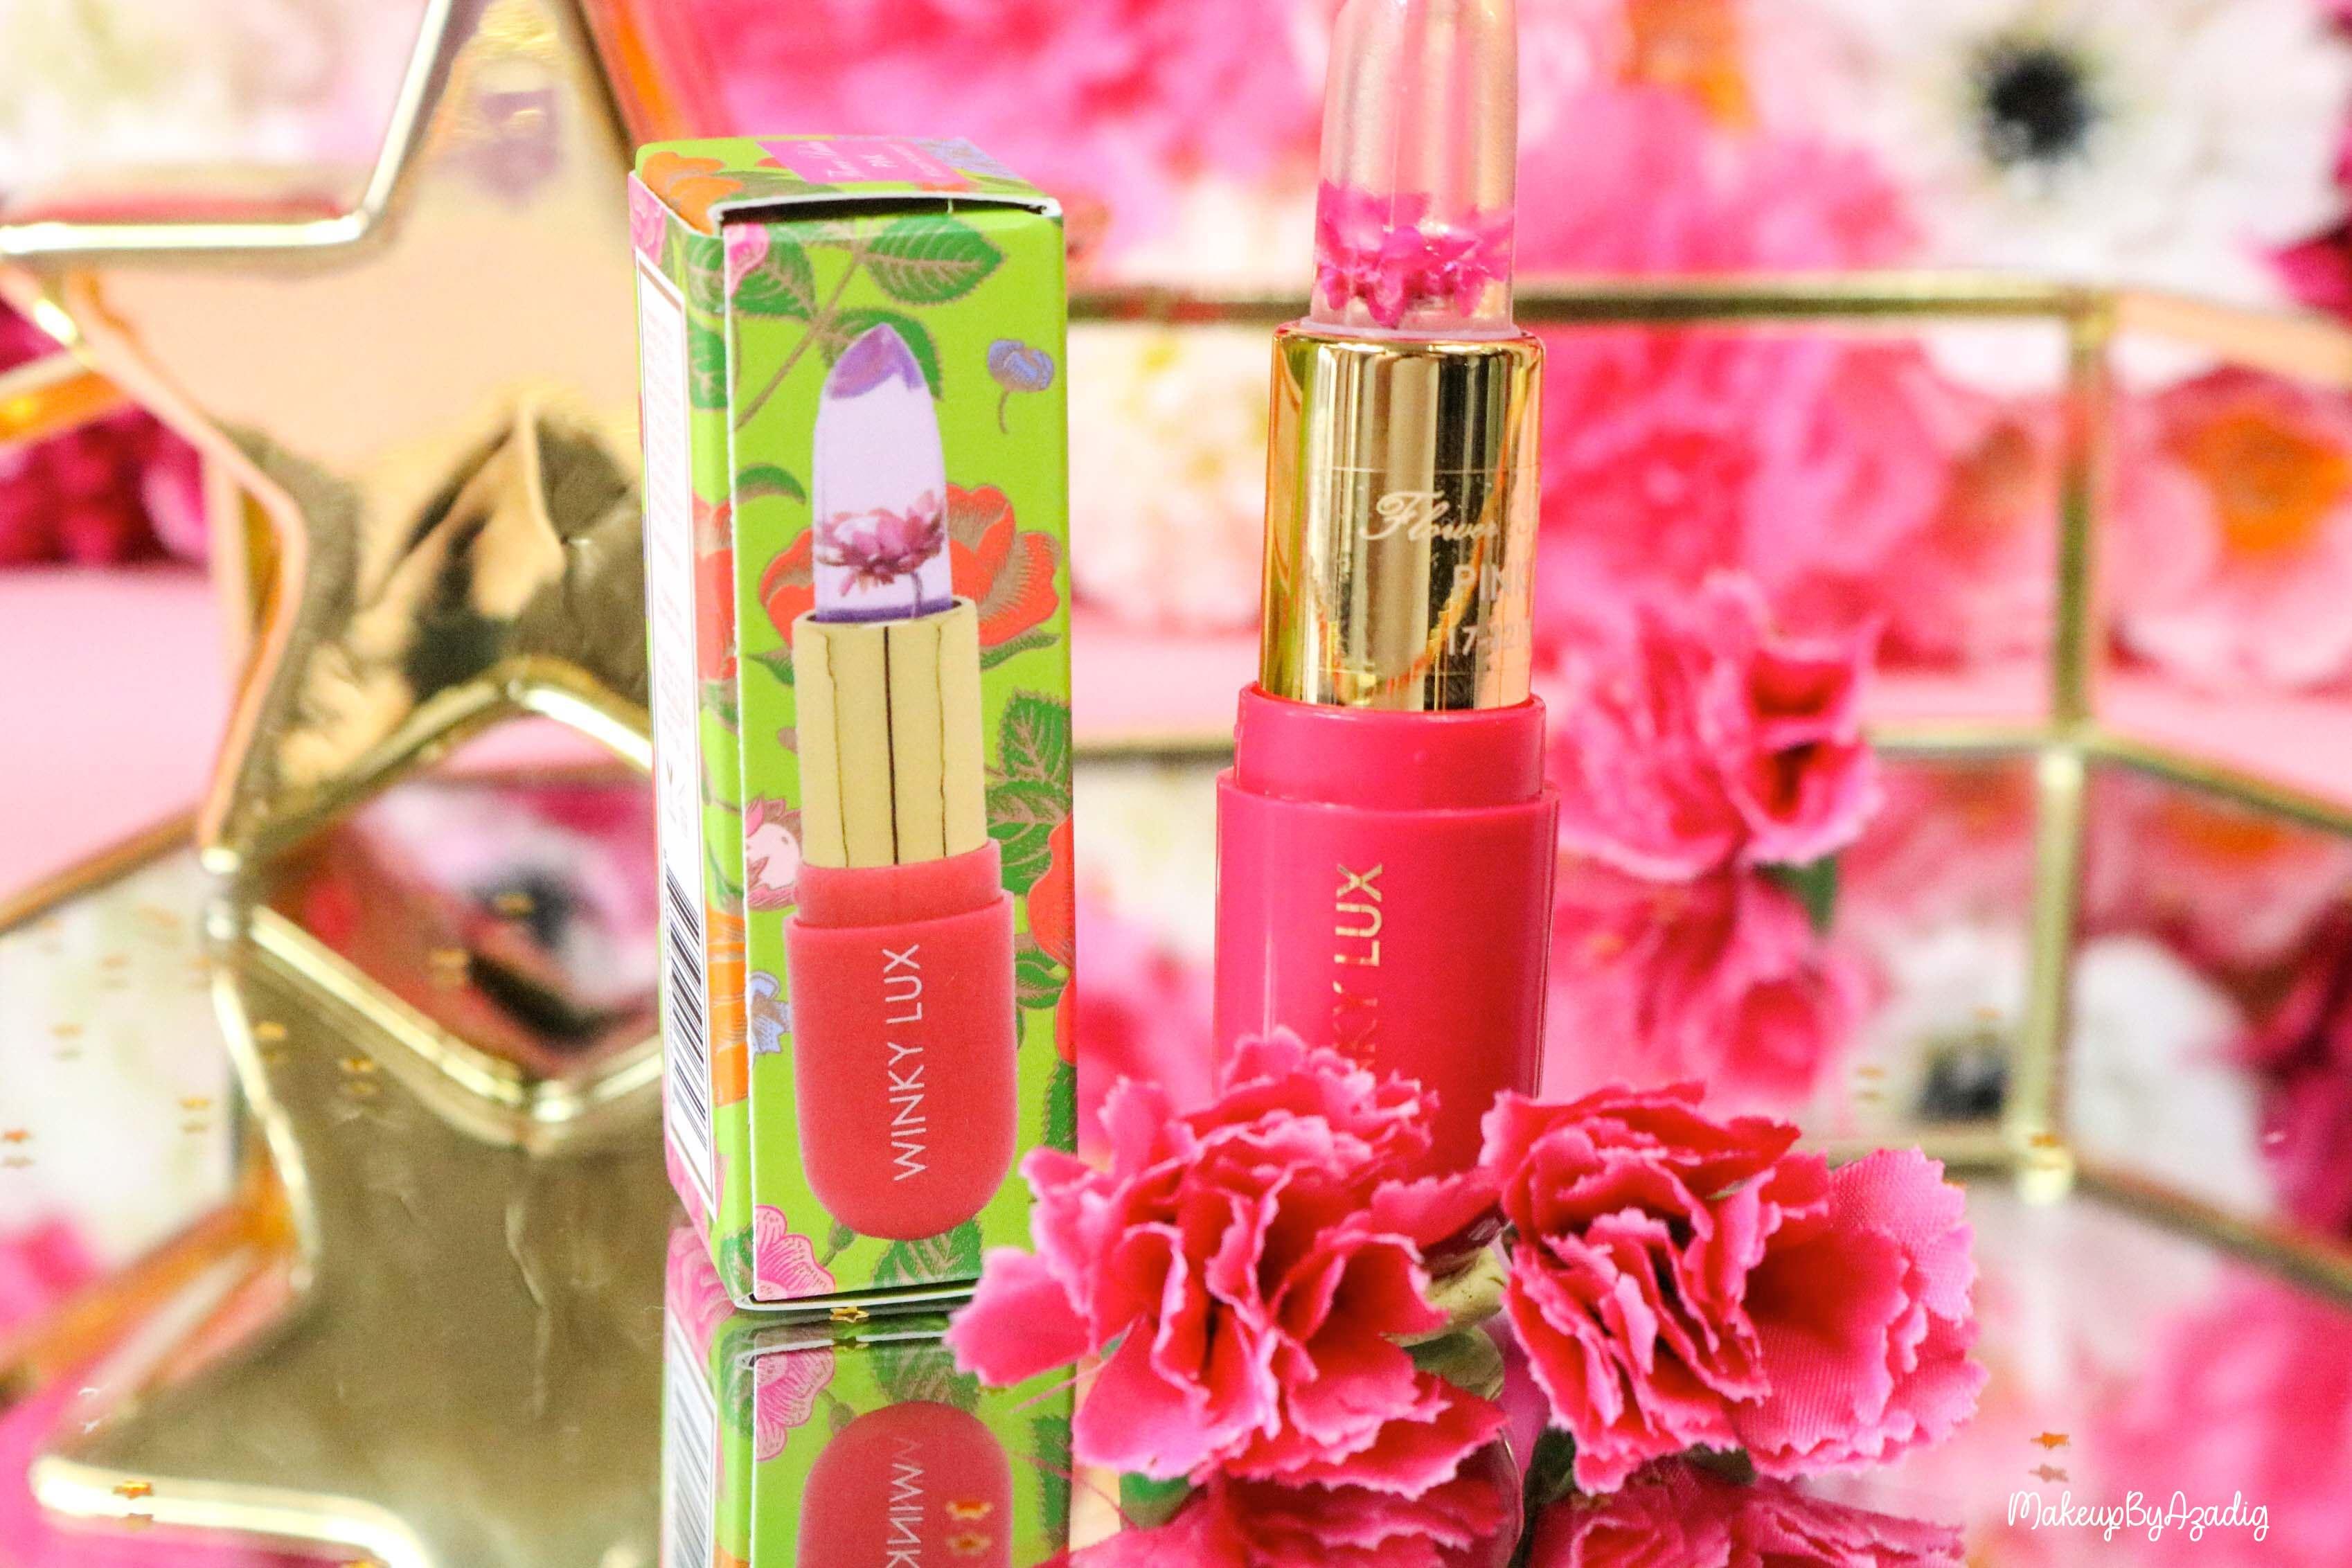 revue-flower-balm-baume-levres-winky-lux-sephora-rose-avis-prix-makeupbyazadig-fleur